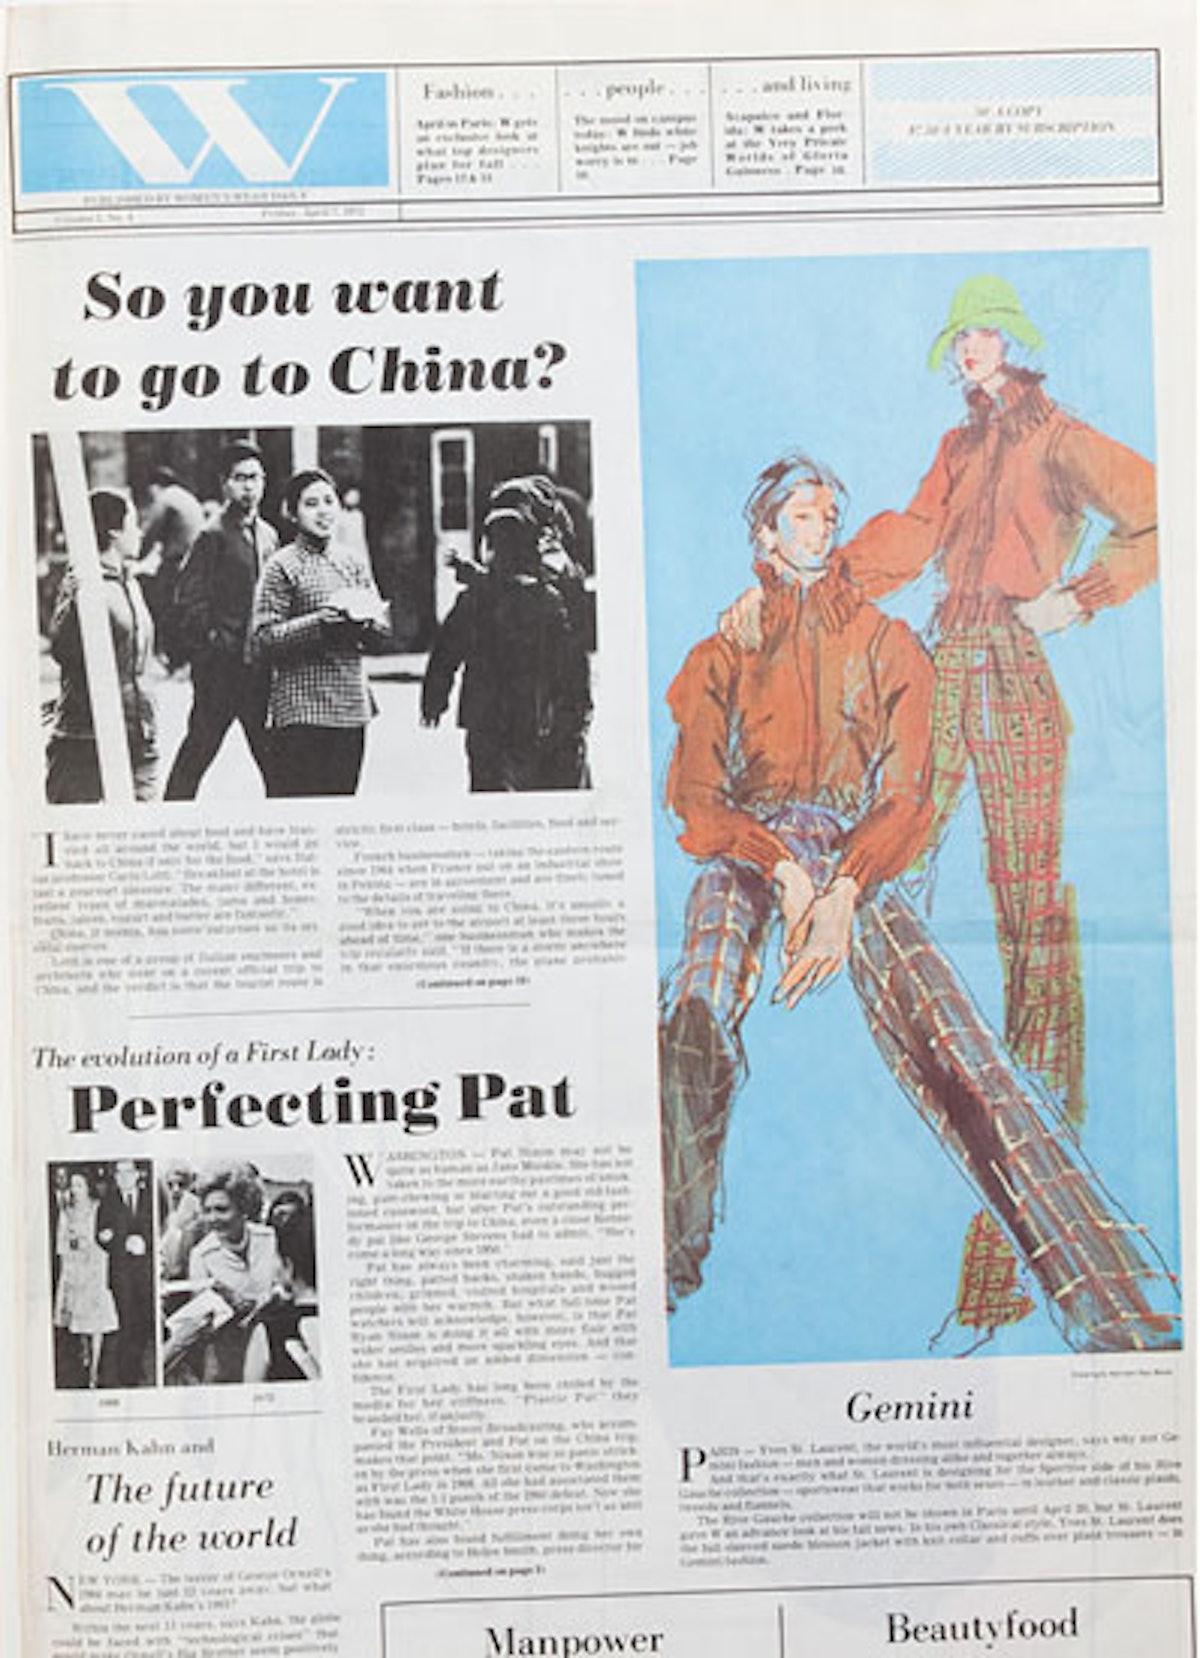 fass-w-timeline-70s-01-v.jpg